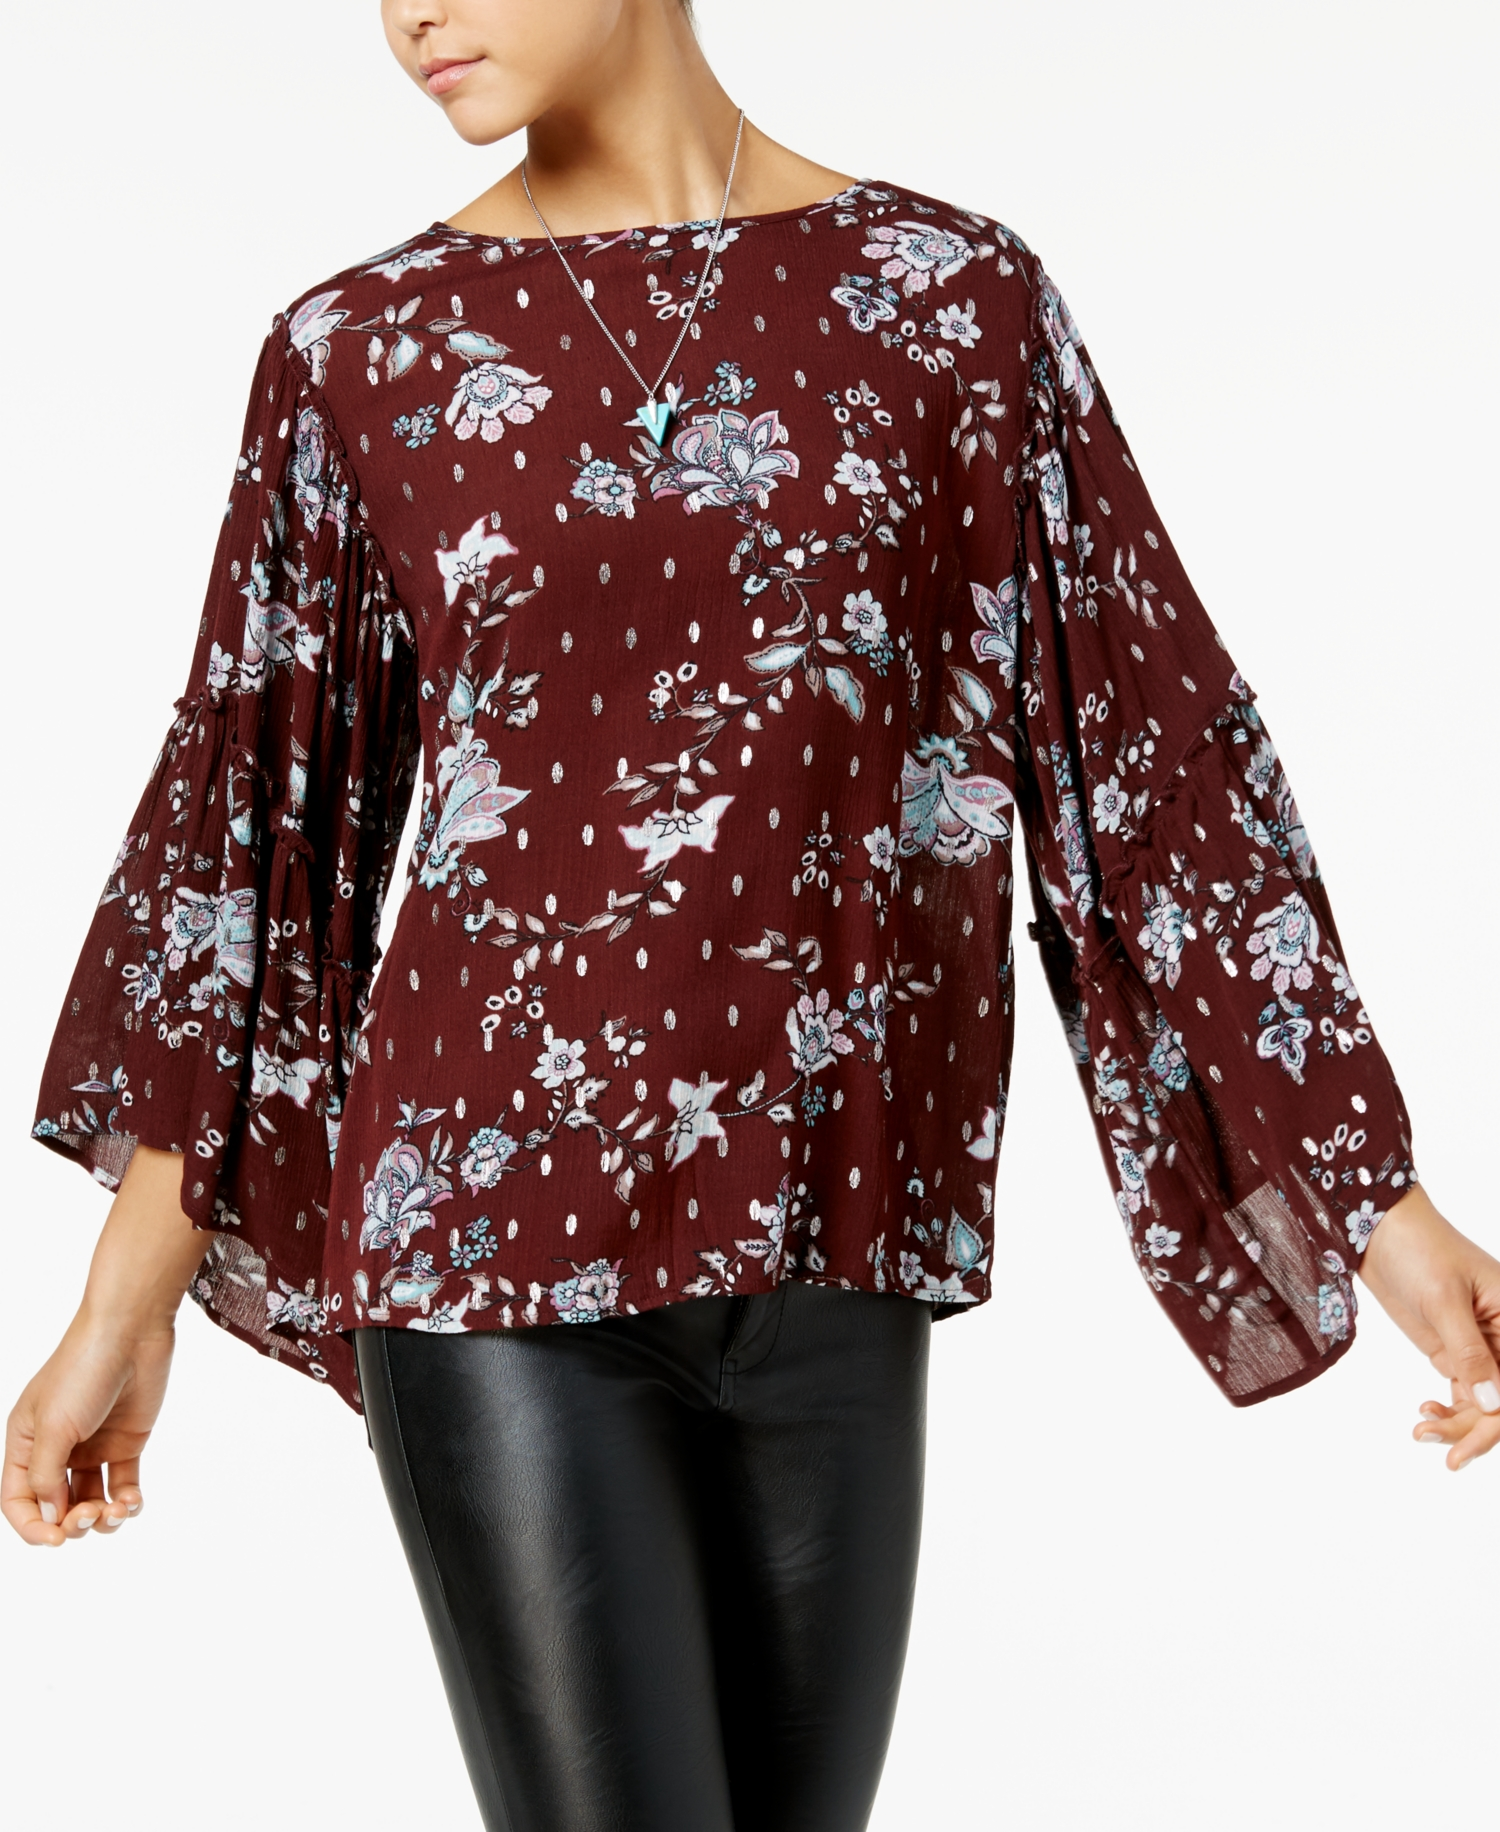 Gypsies and Moondust Juniors Ruffle-Sleeved Sweatshirt